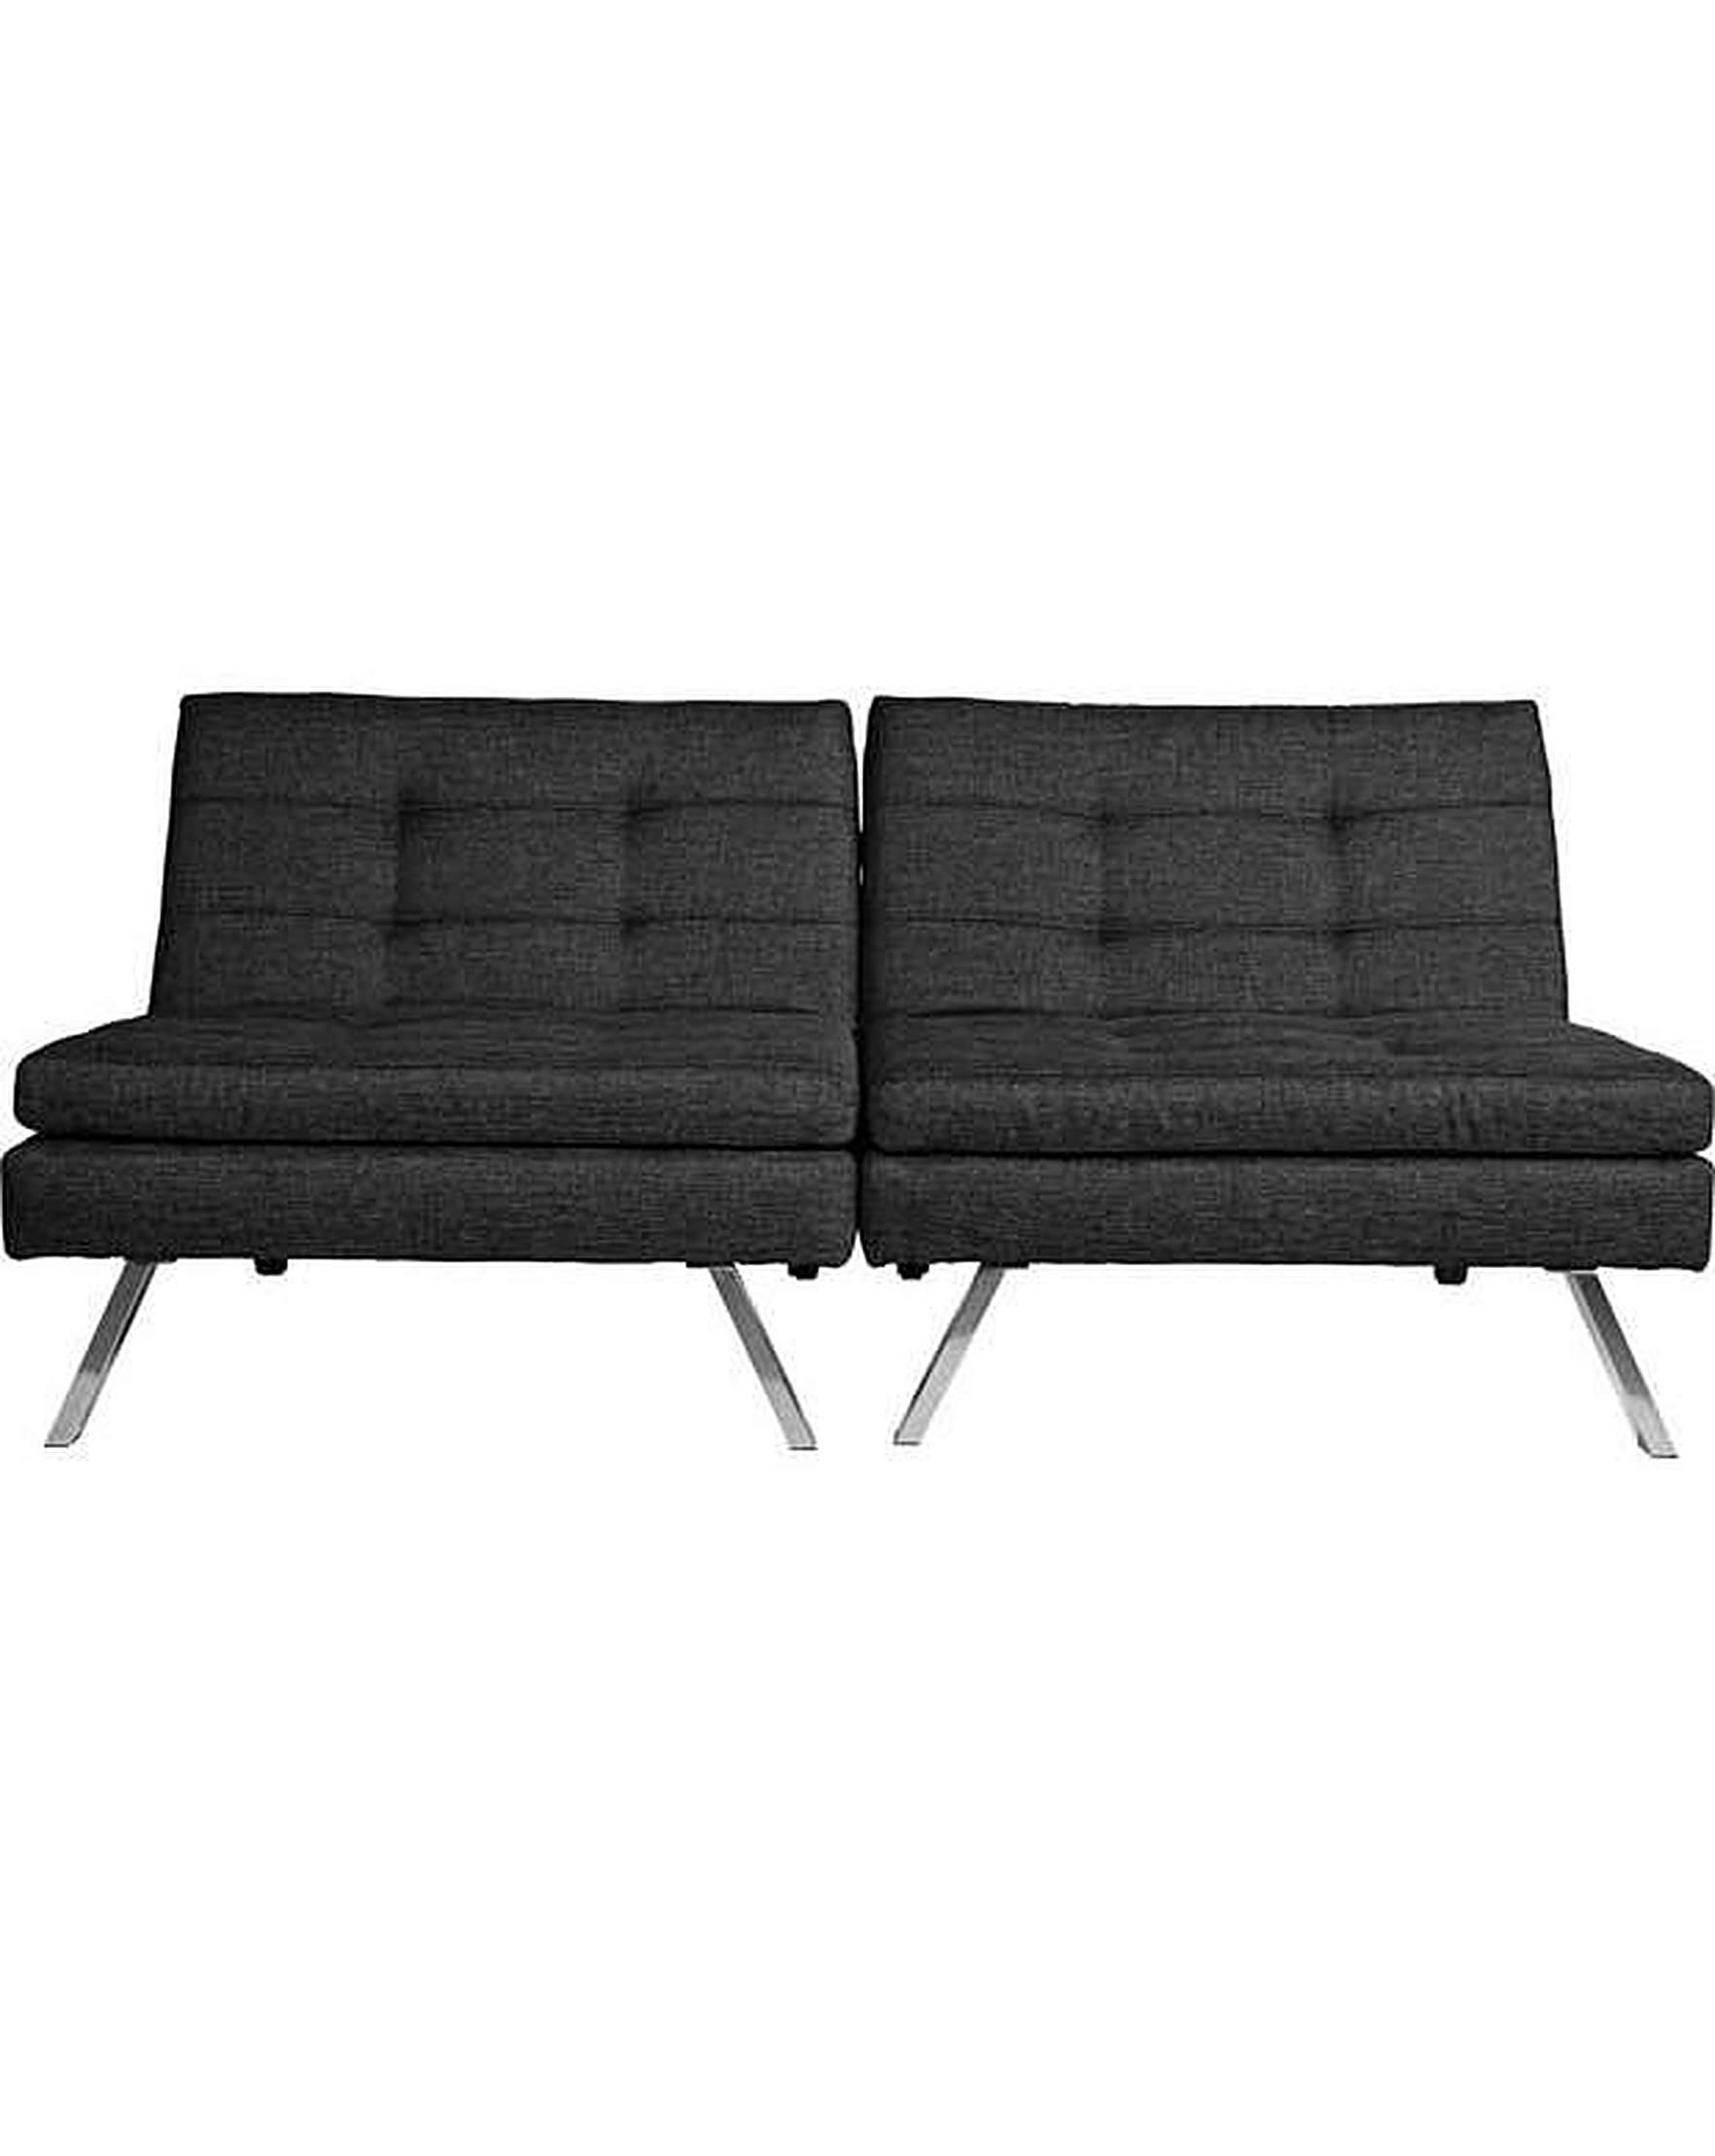 Duo Fabric Clic Clac Sofa Bed Black